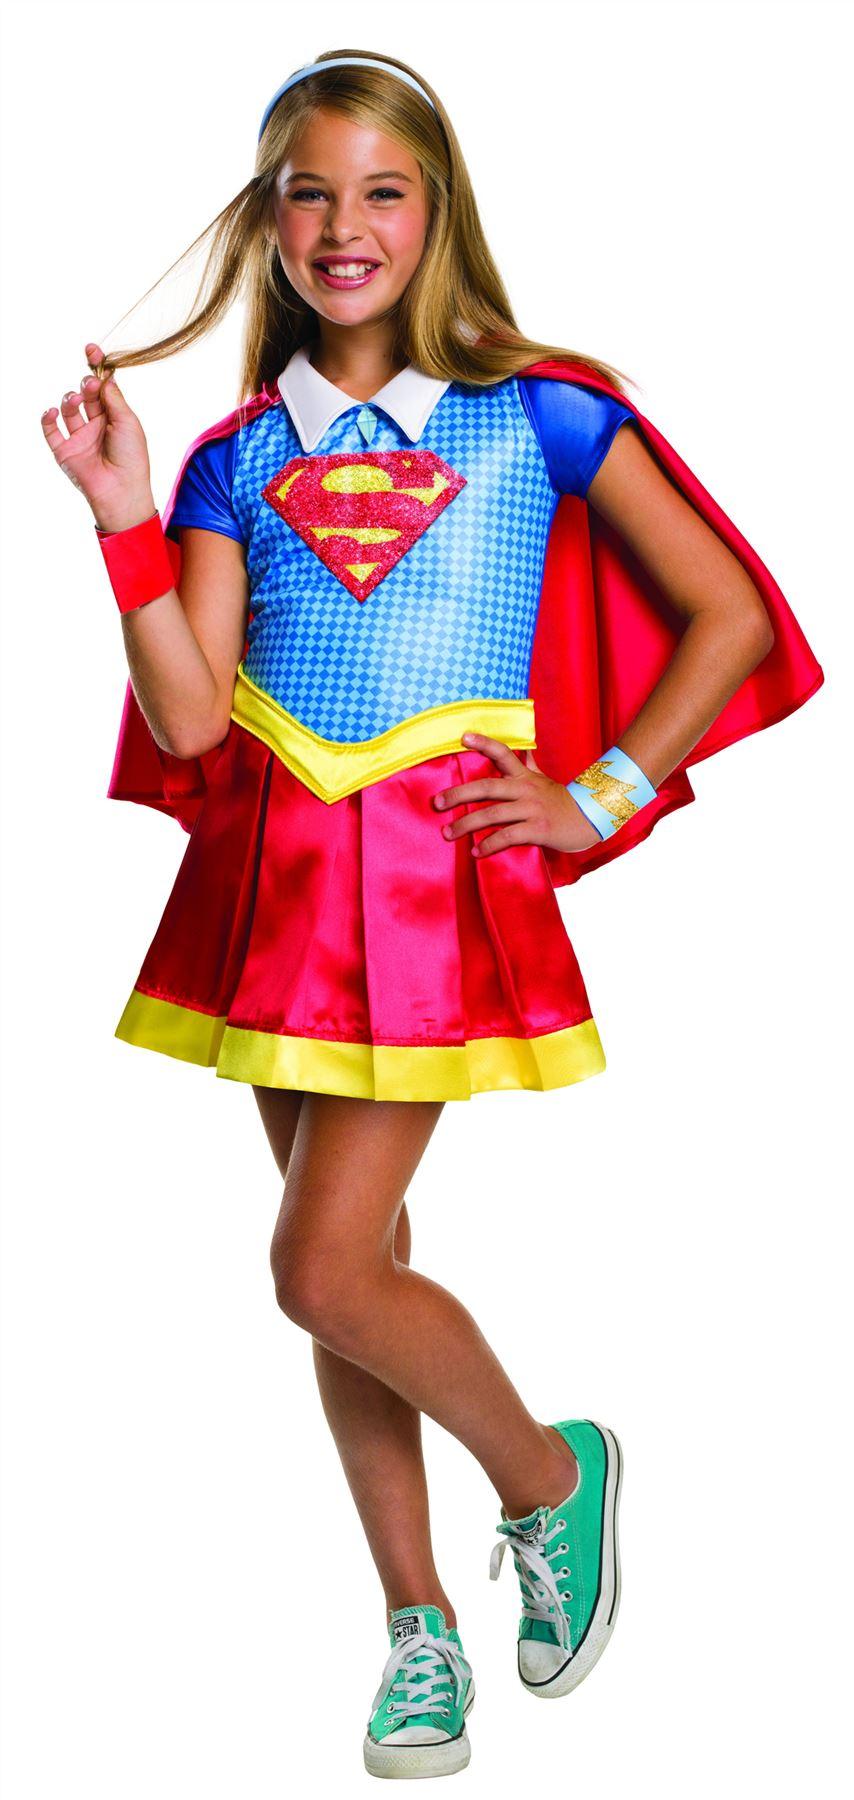 Girls deluxe supergirl costume superhero fancy dress dc comics halloween outfit ebay - Image super heros fille ...